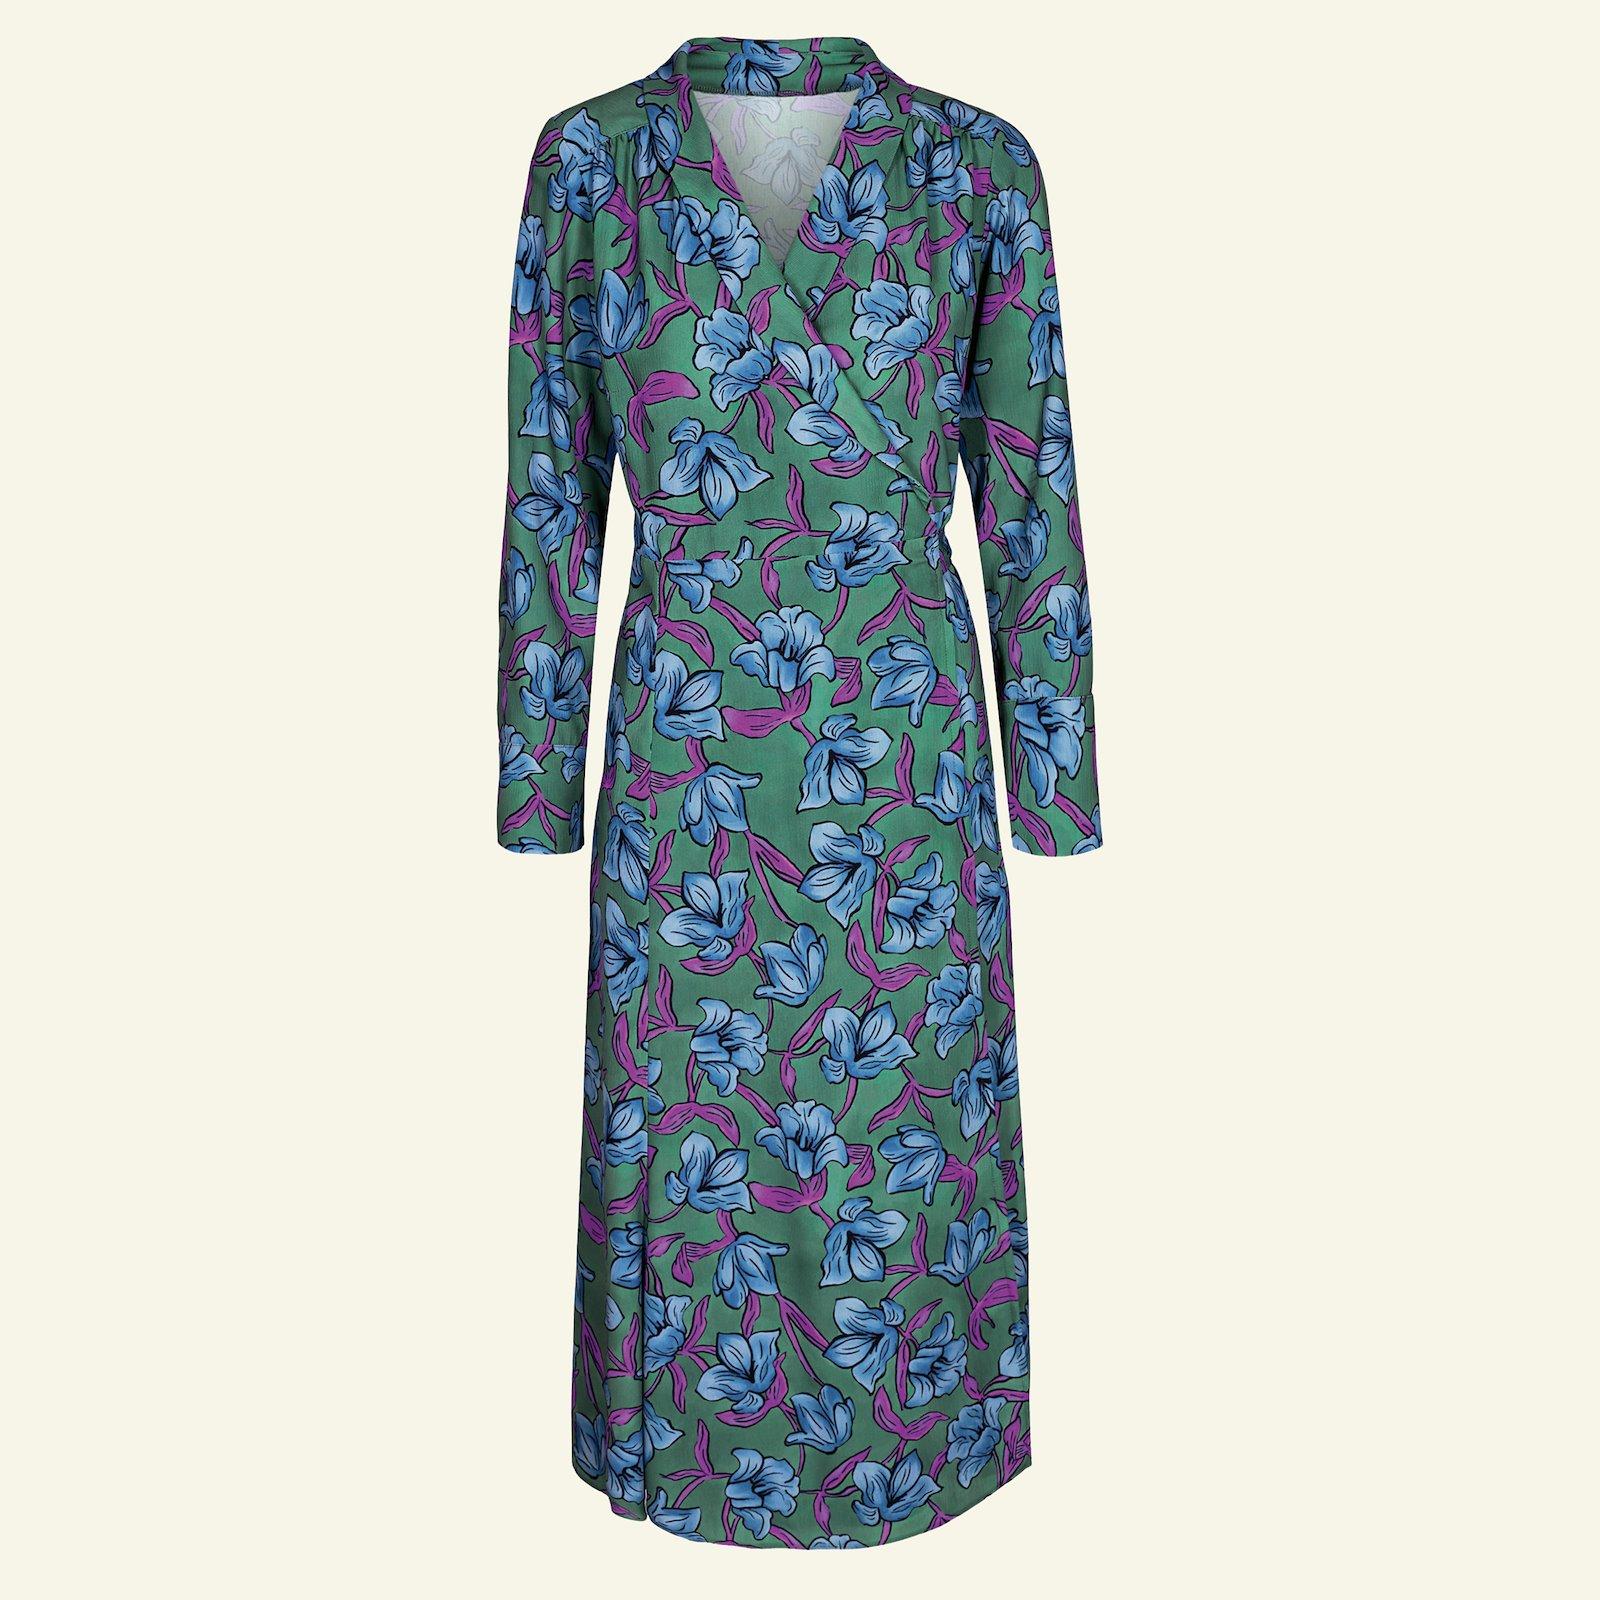 Wrap around dress, 34/6 p23160_630005_sskit